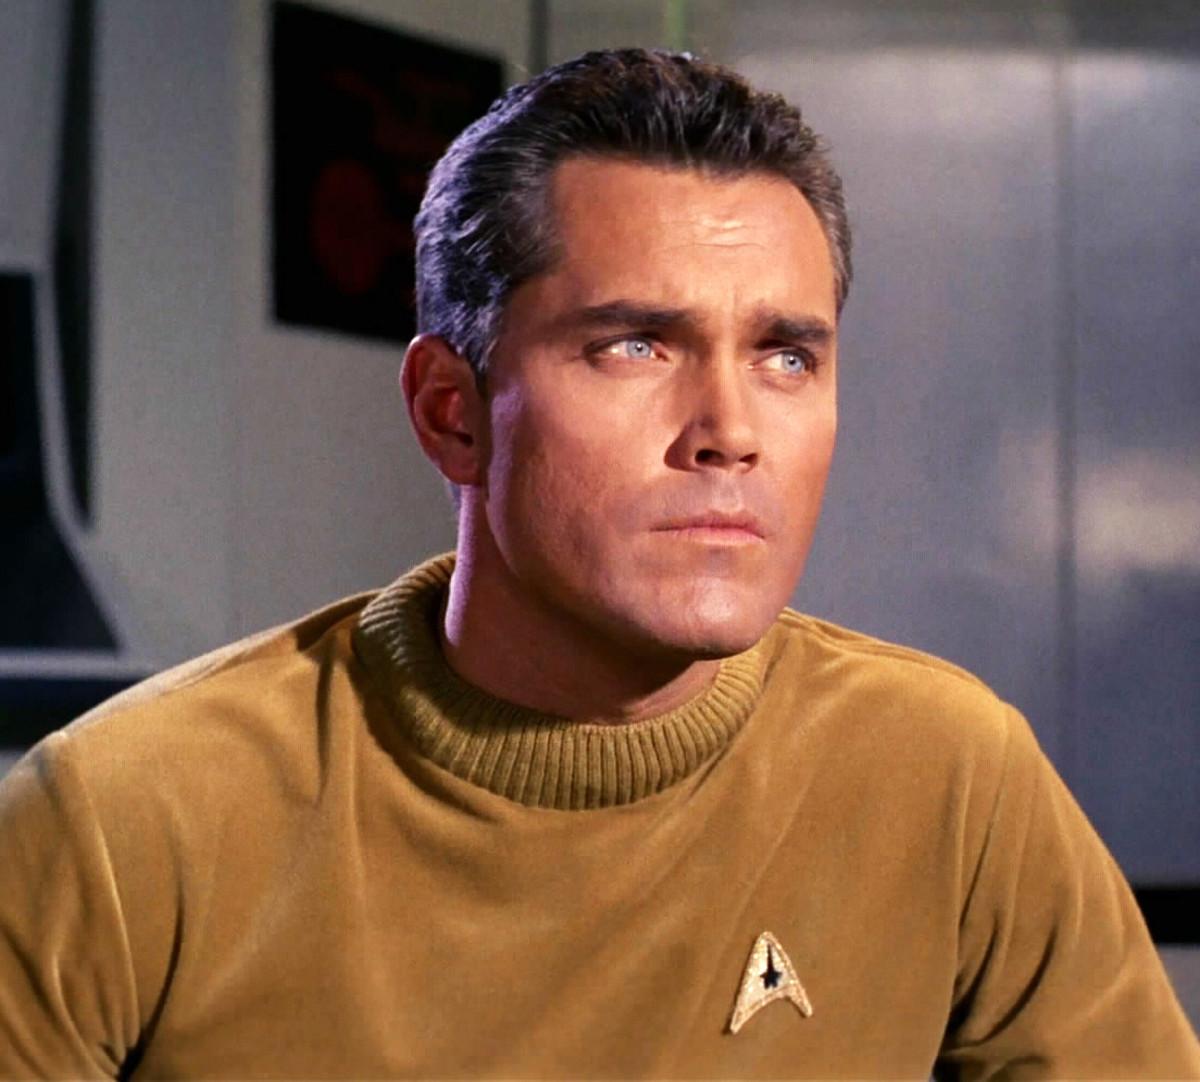 Jeffrey Hunter as Captain Christopher Pike of the Starship Enterprise